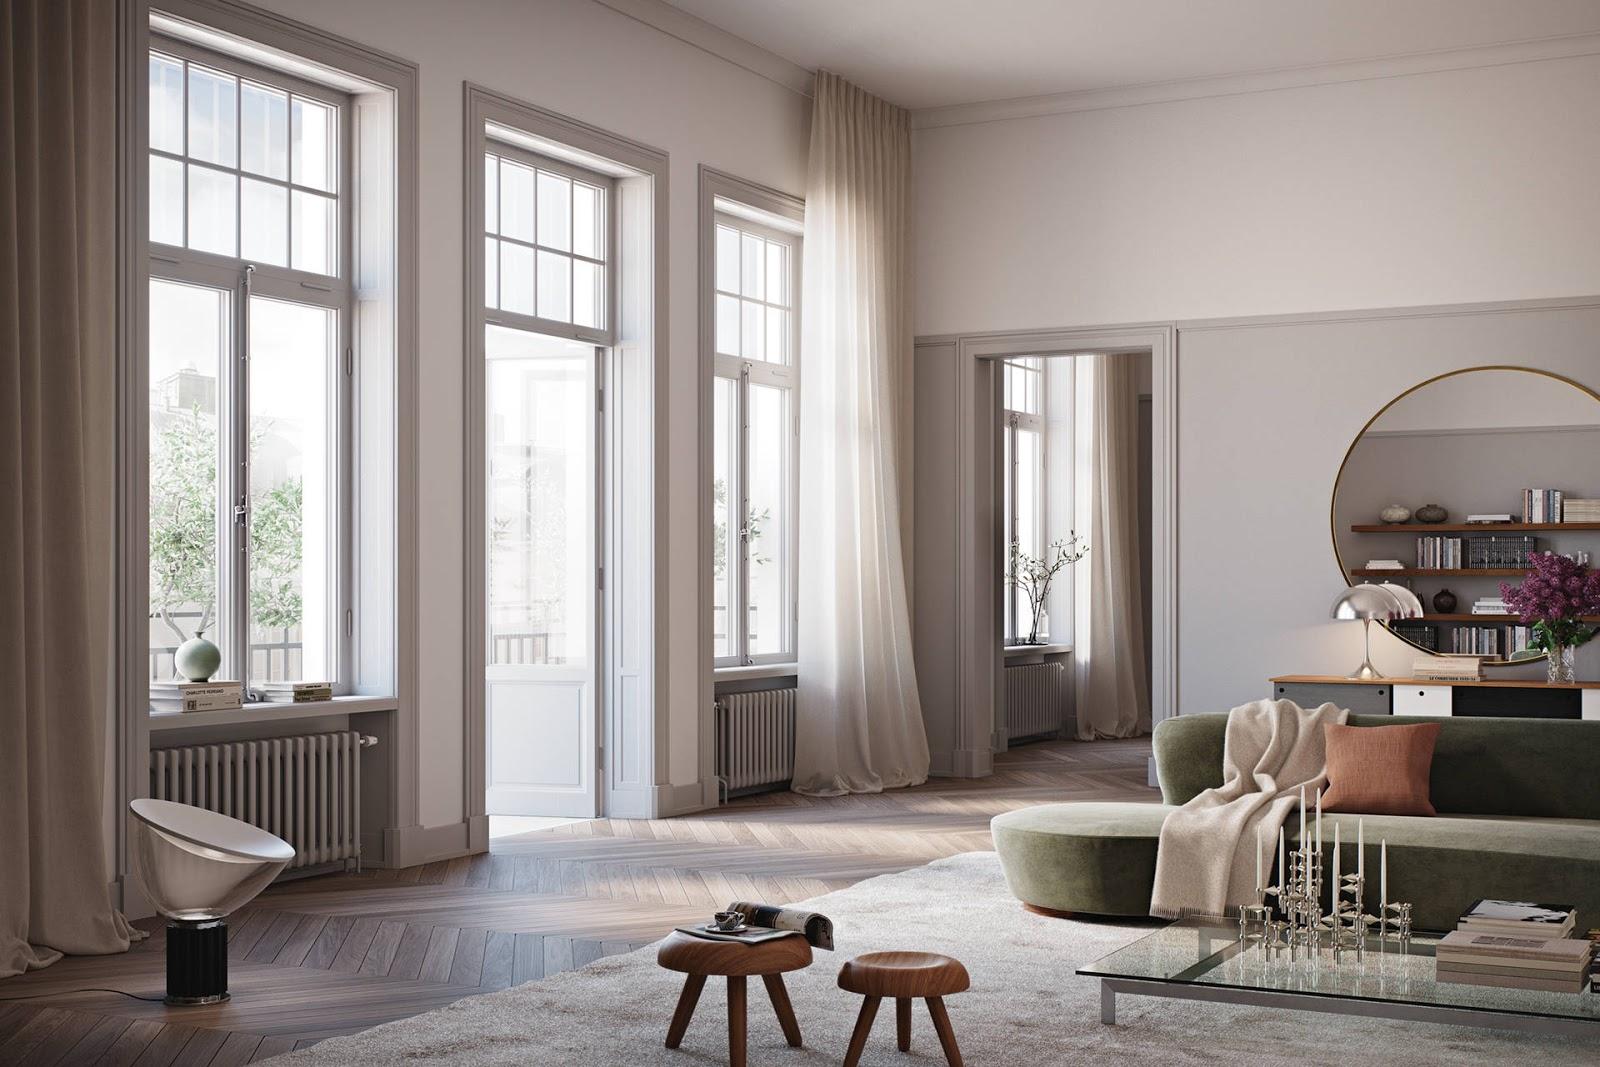 Zweeds Gemixt Appartement : Zweedse woonkamer best een warm interieur in zweden with zweedse